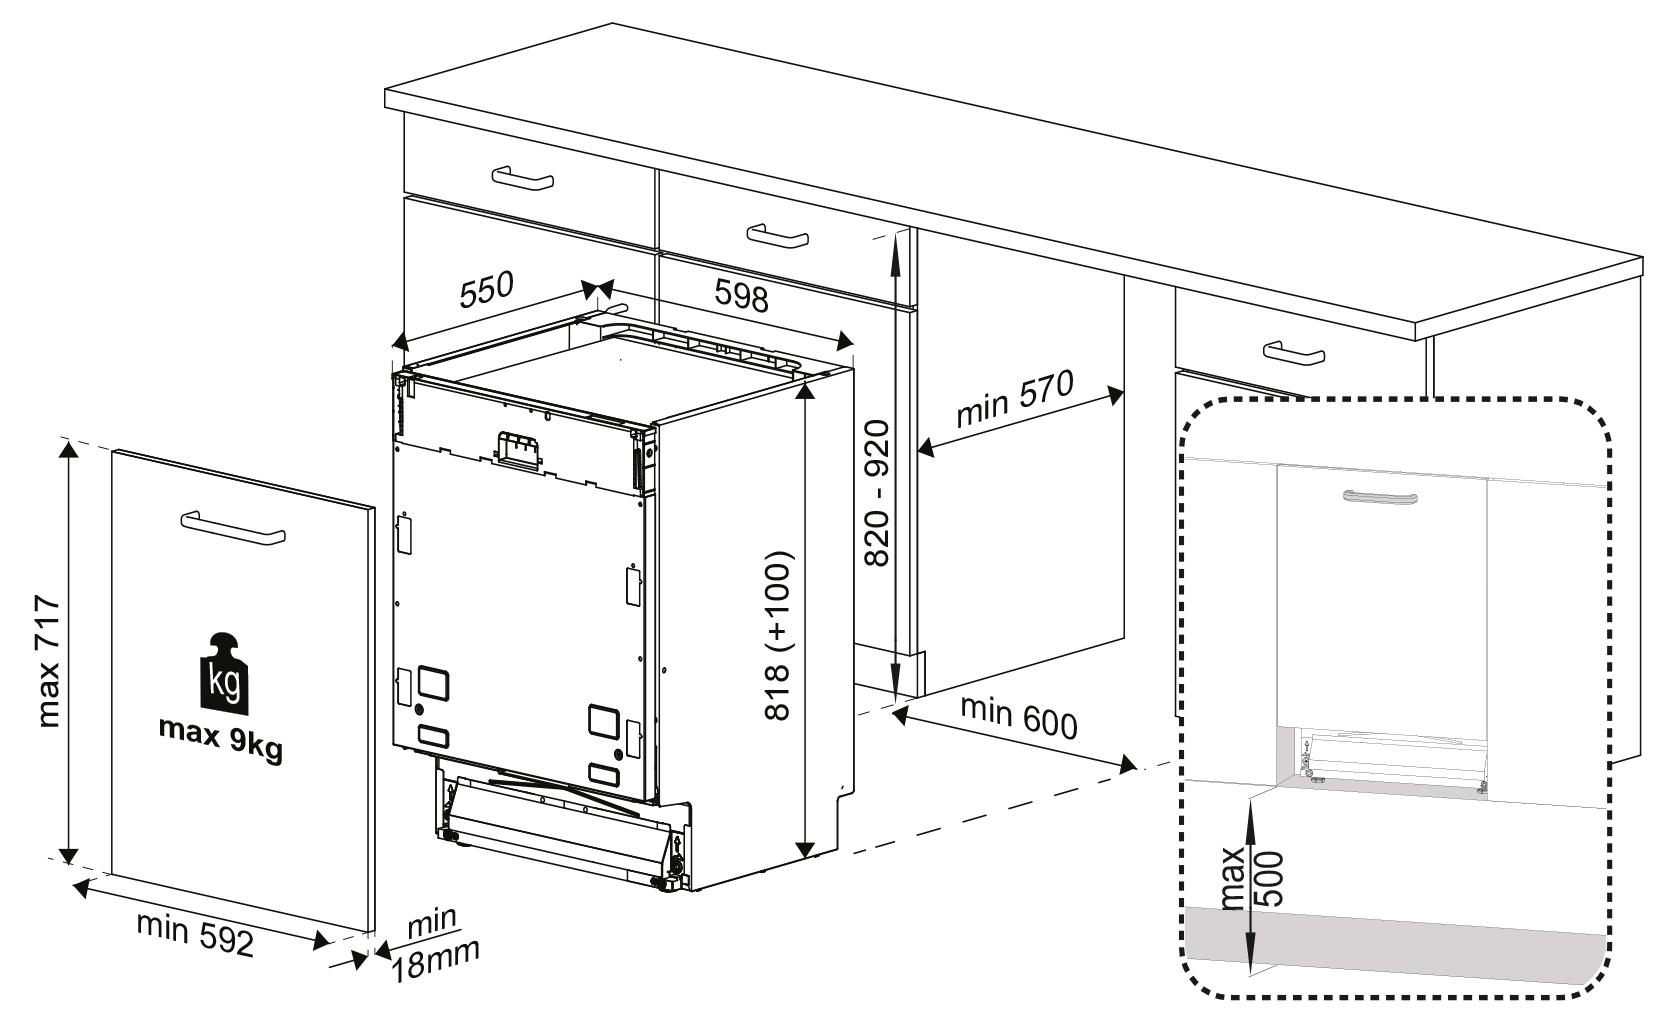 edition 70 vi geschirrsp ler vollintegrierter geschirrsp ler. Black Bedroom Furniture Sets. Home Design Ideas